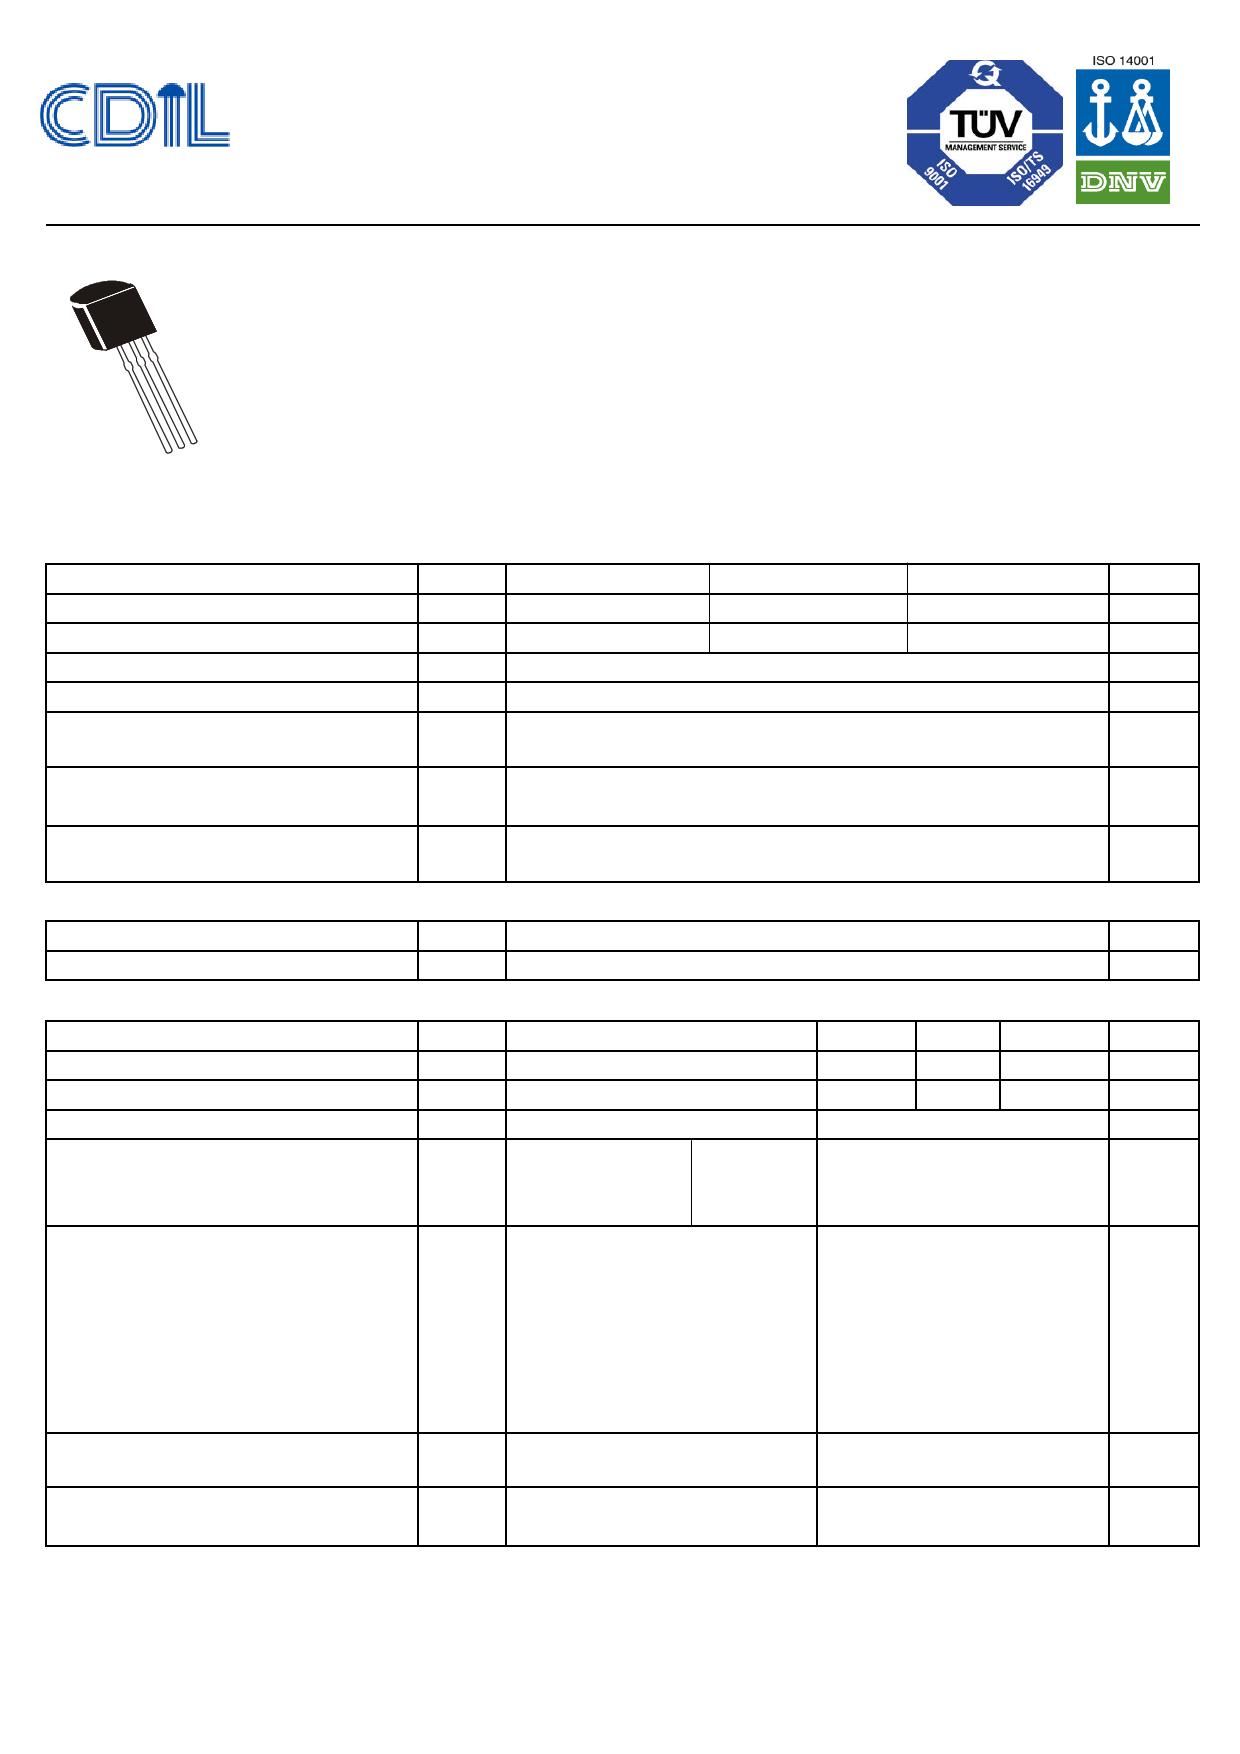 BC485L 데이터시트 및 BC485L PDF